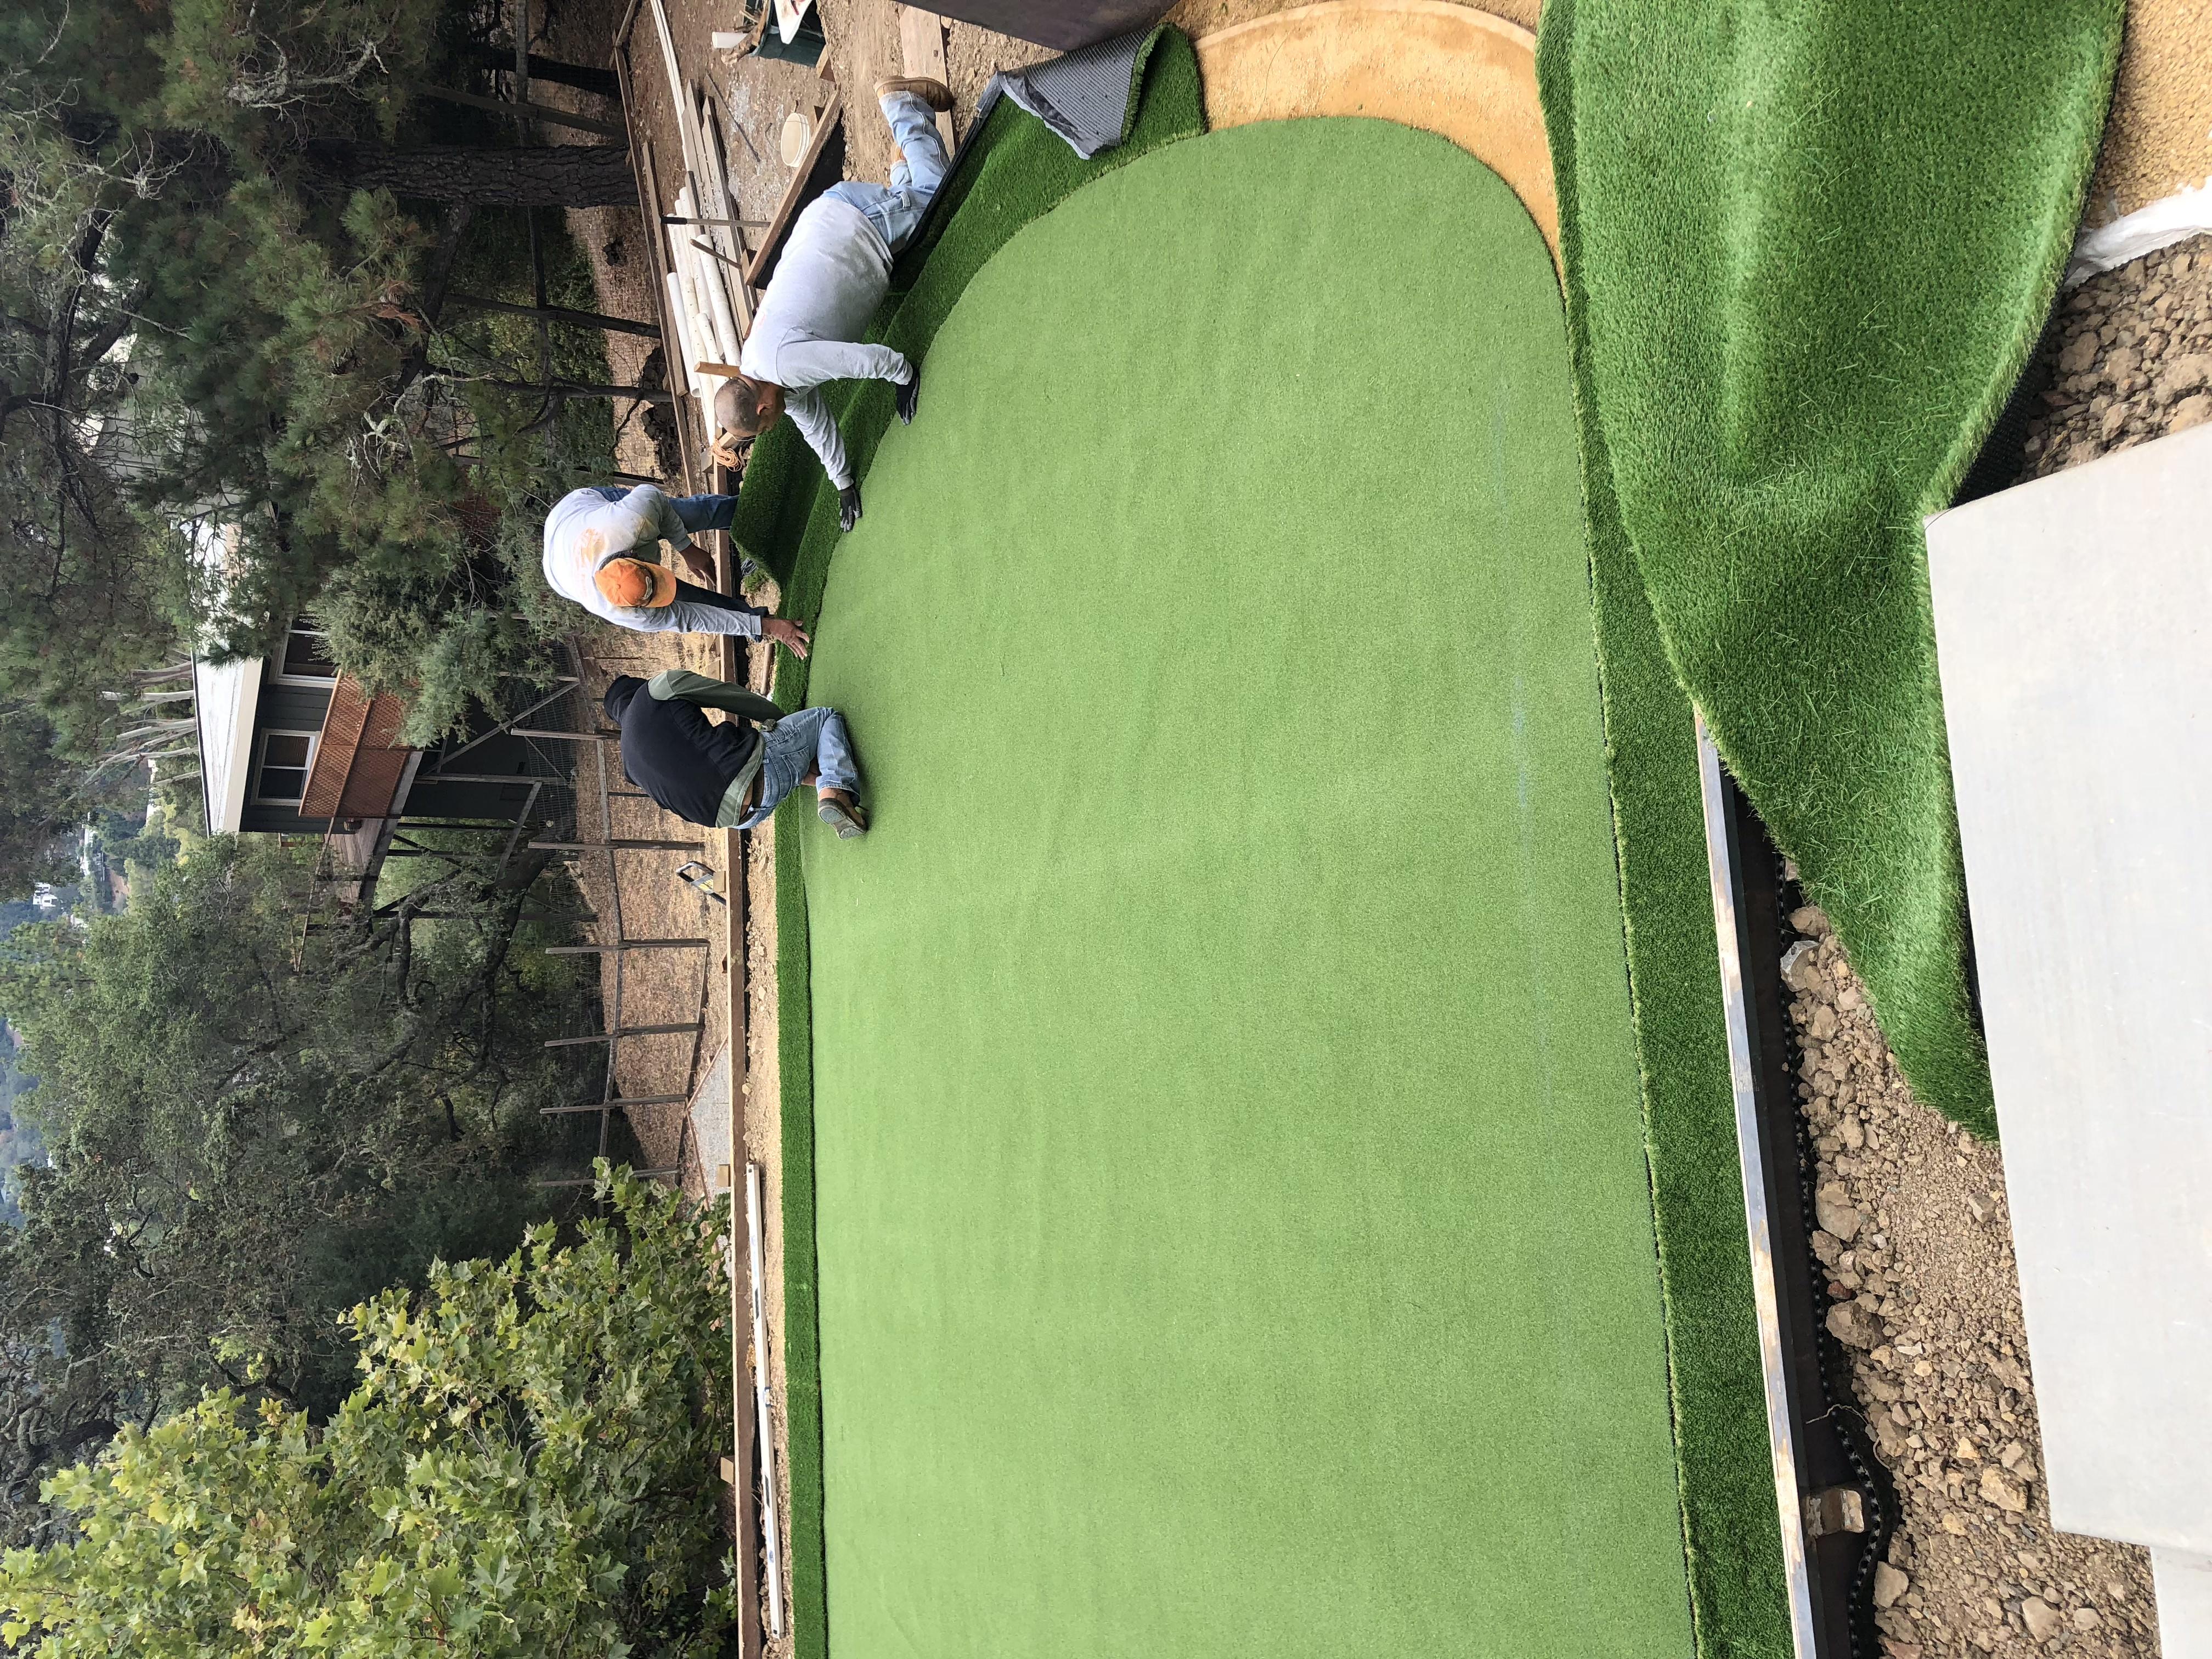 U Blade-80 fake grass for yard,backyard turf,turf backyard,turf yard,fake grass for backyard